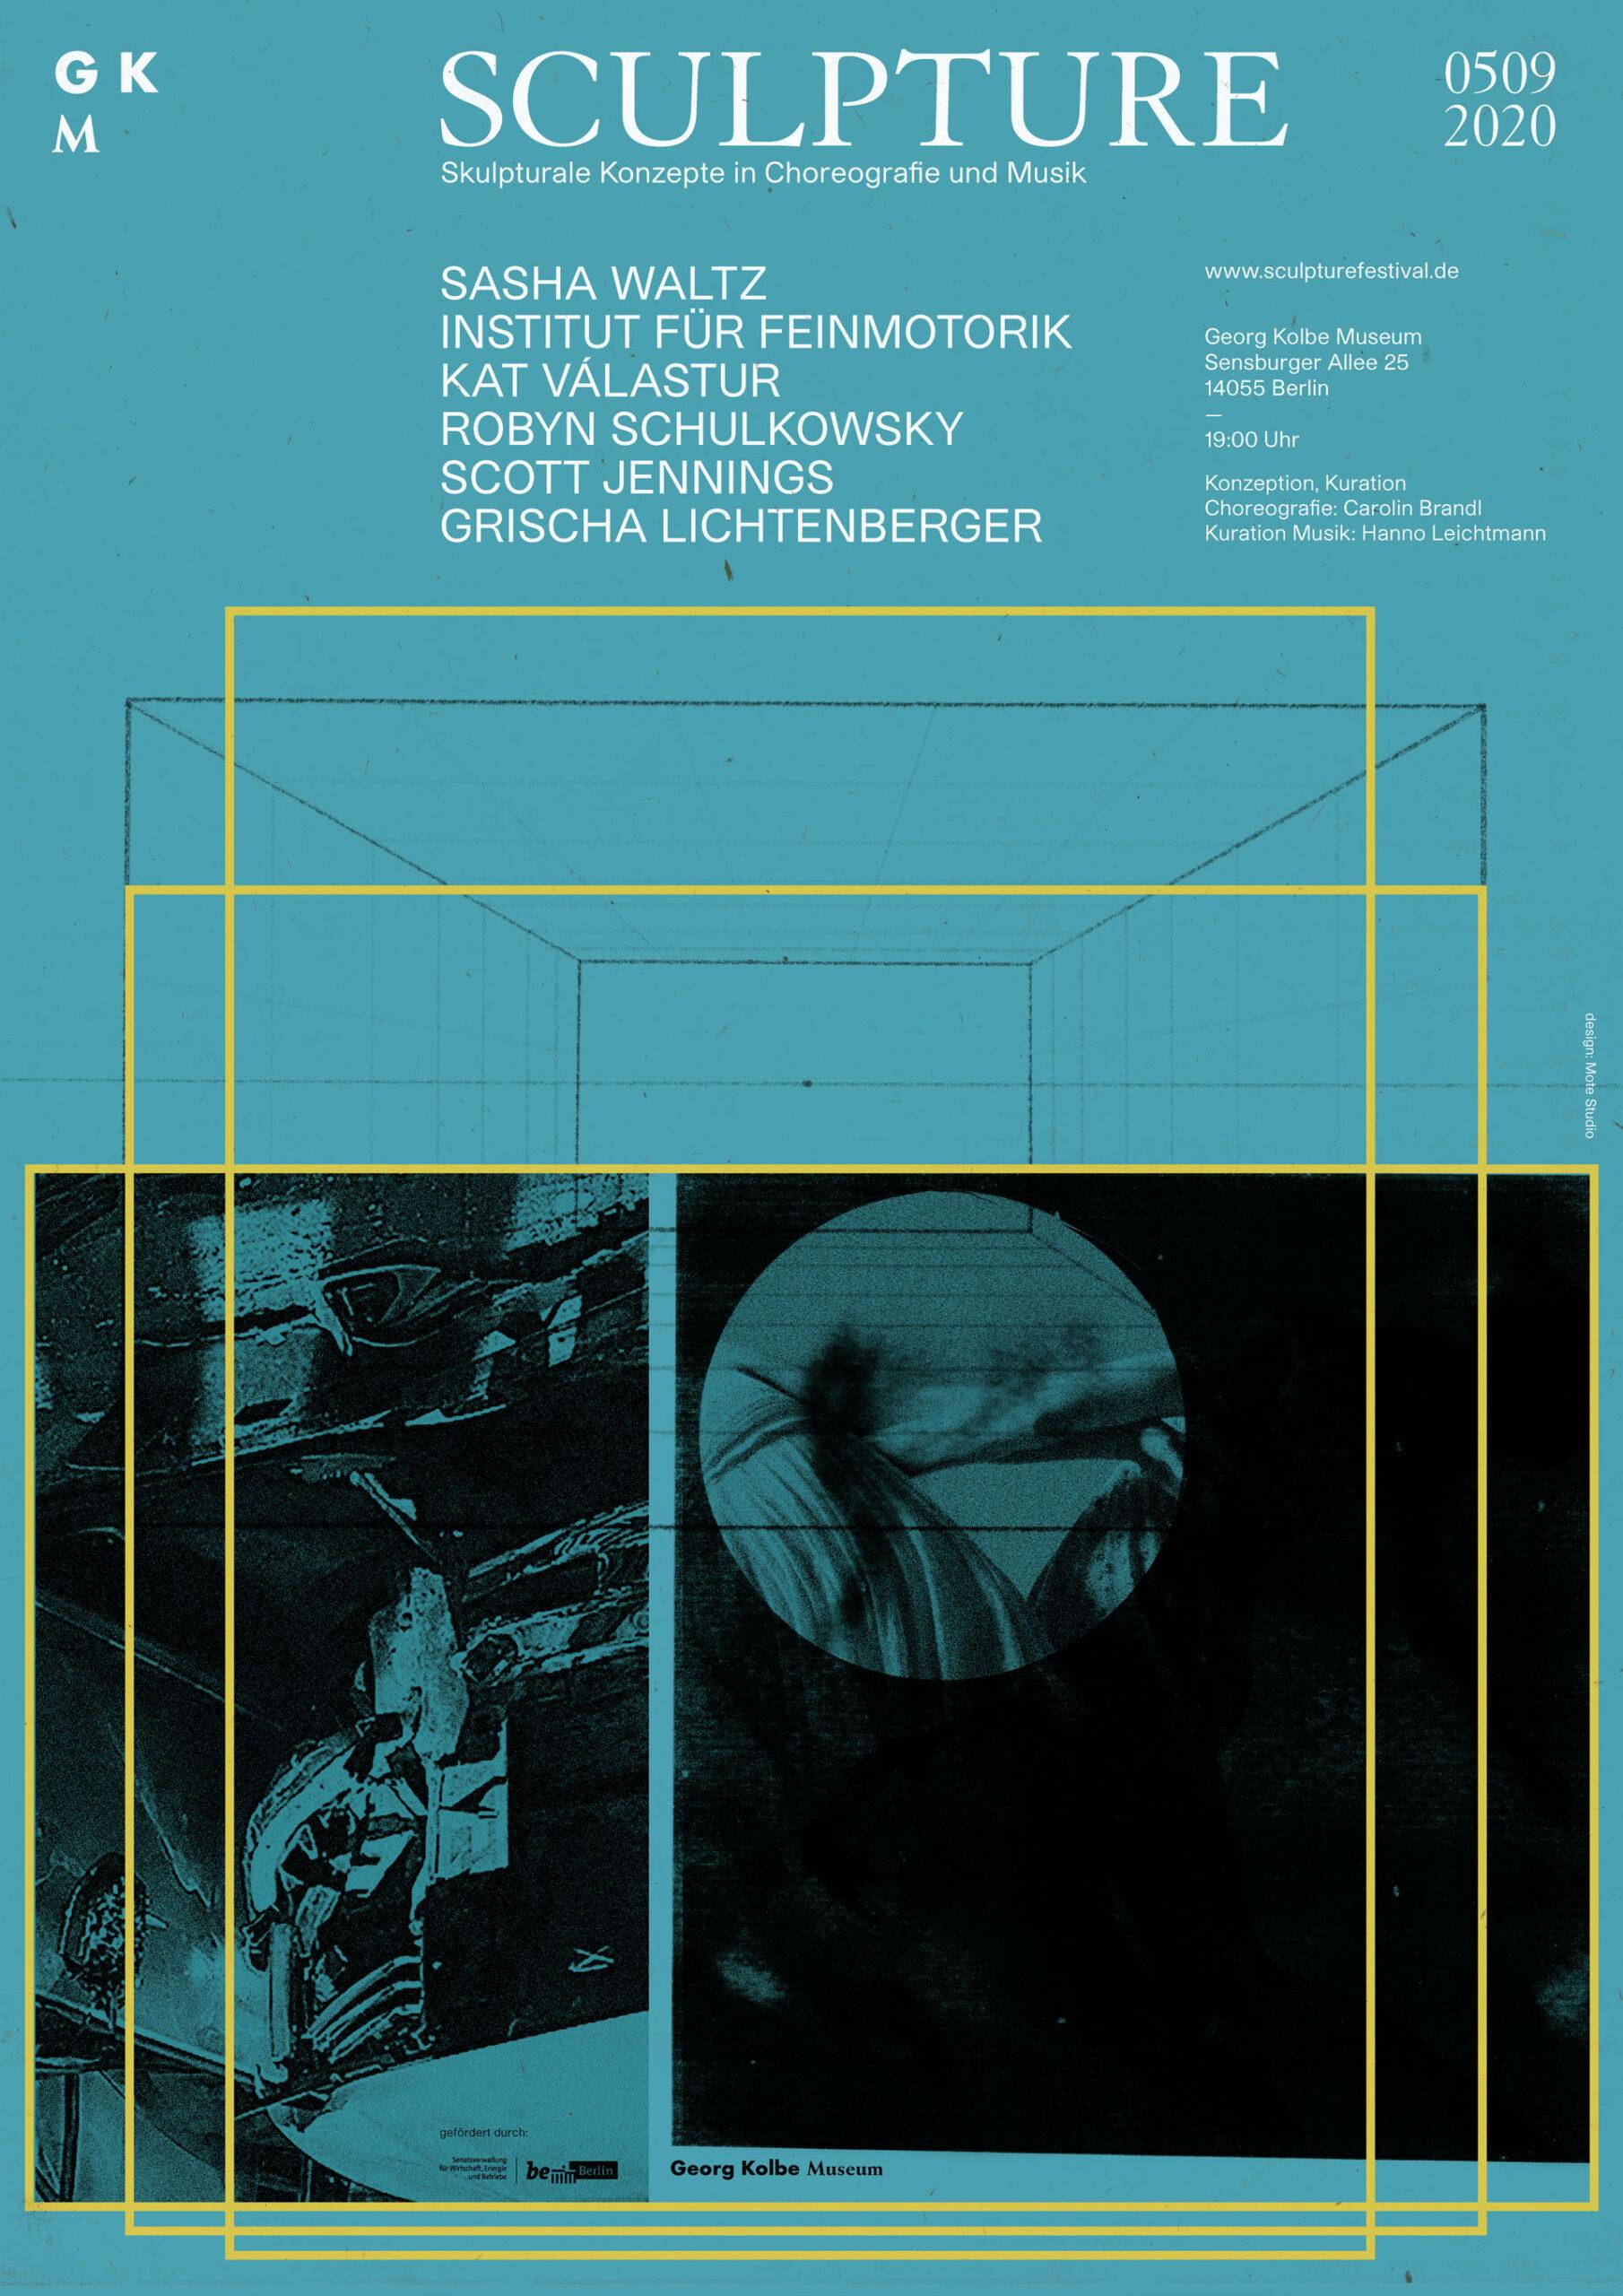 SCU_Poster_digital_low